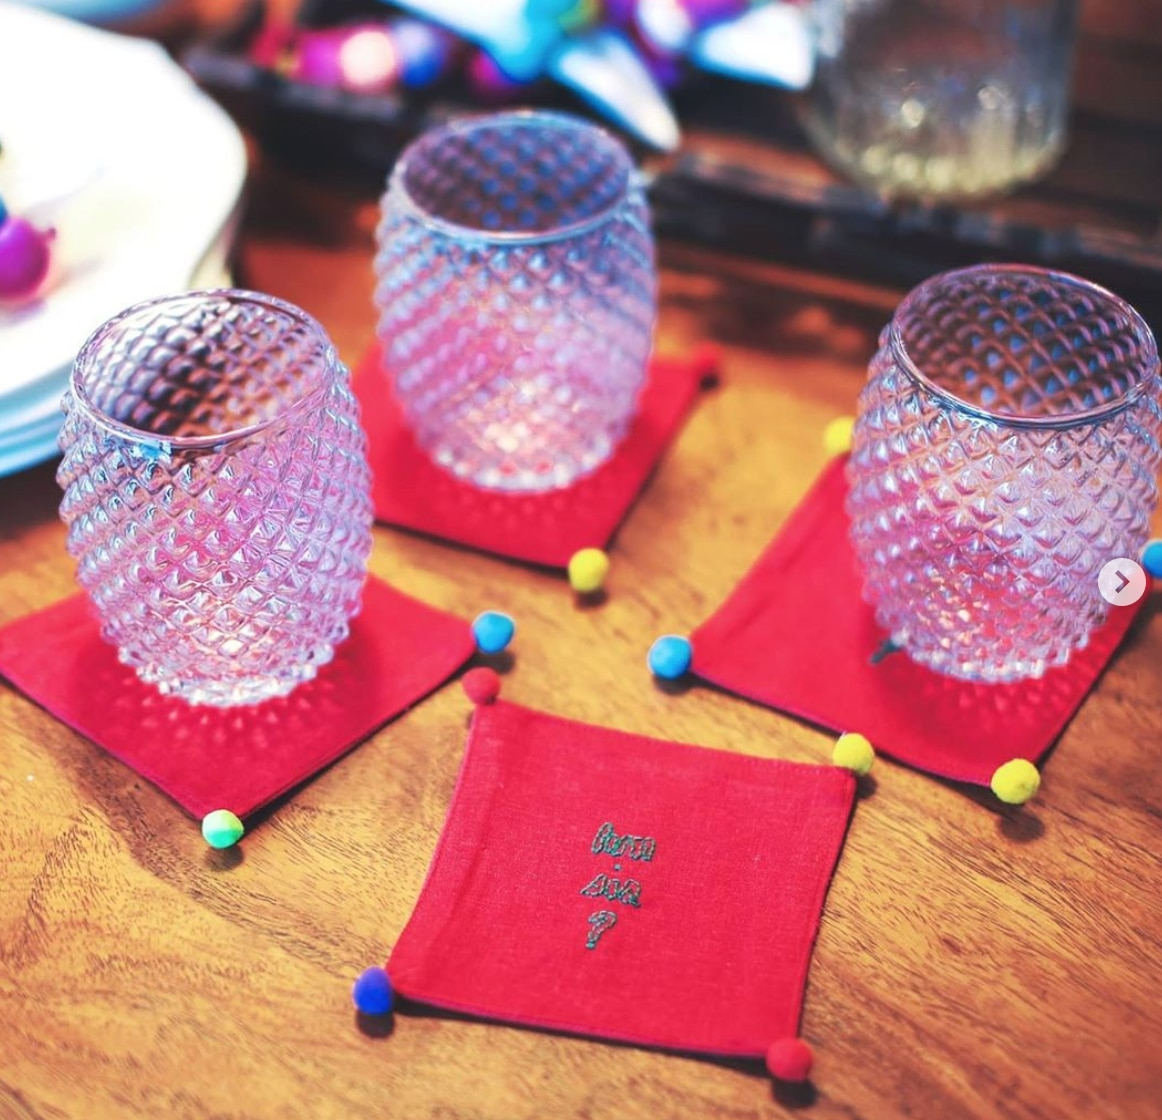 Metro Editors' Picks: Handcrafted Table Linens